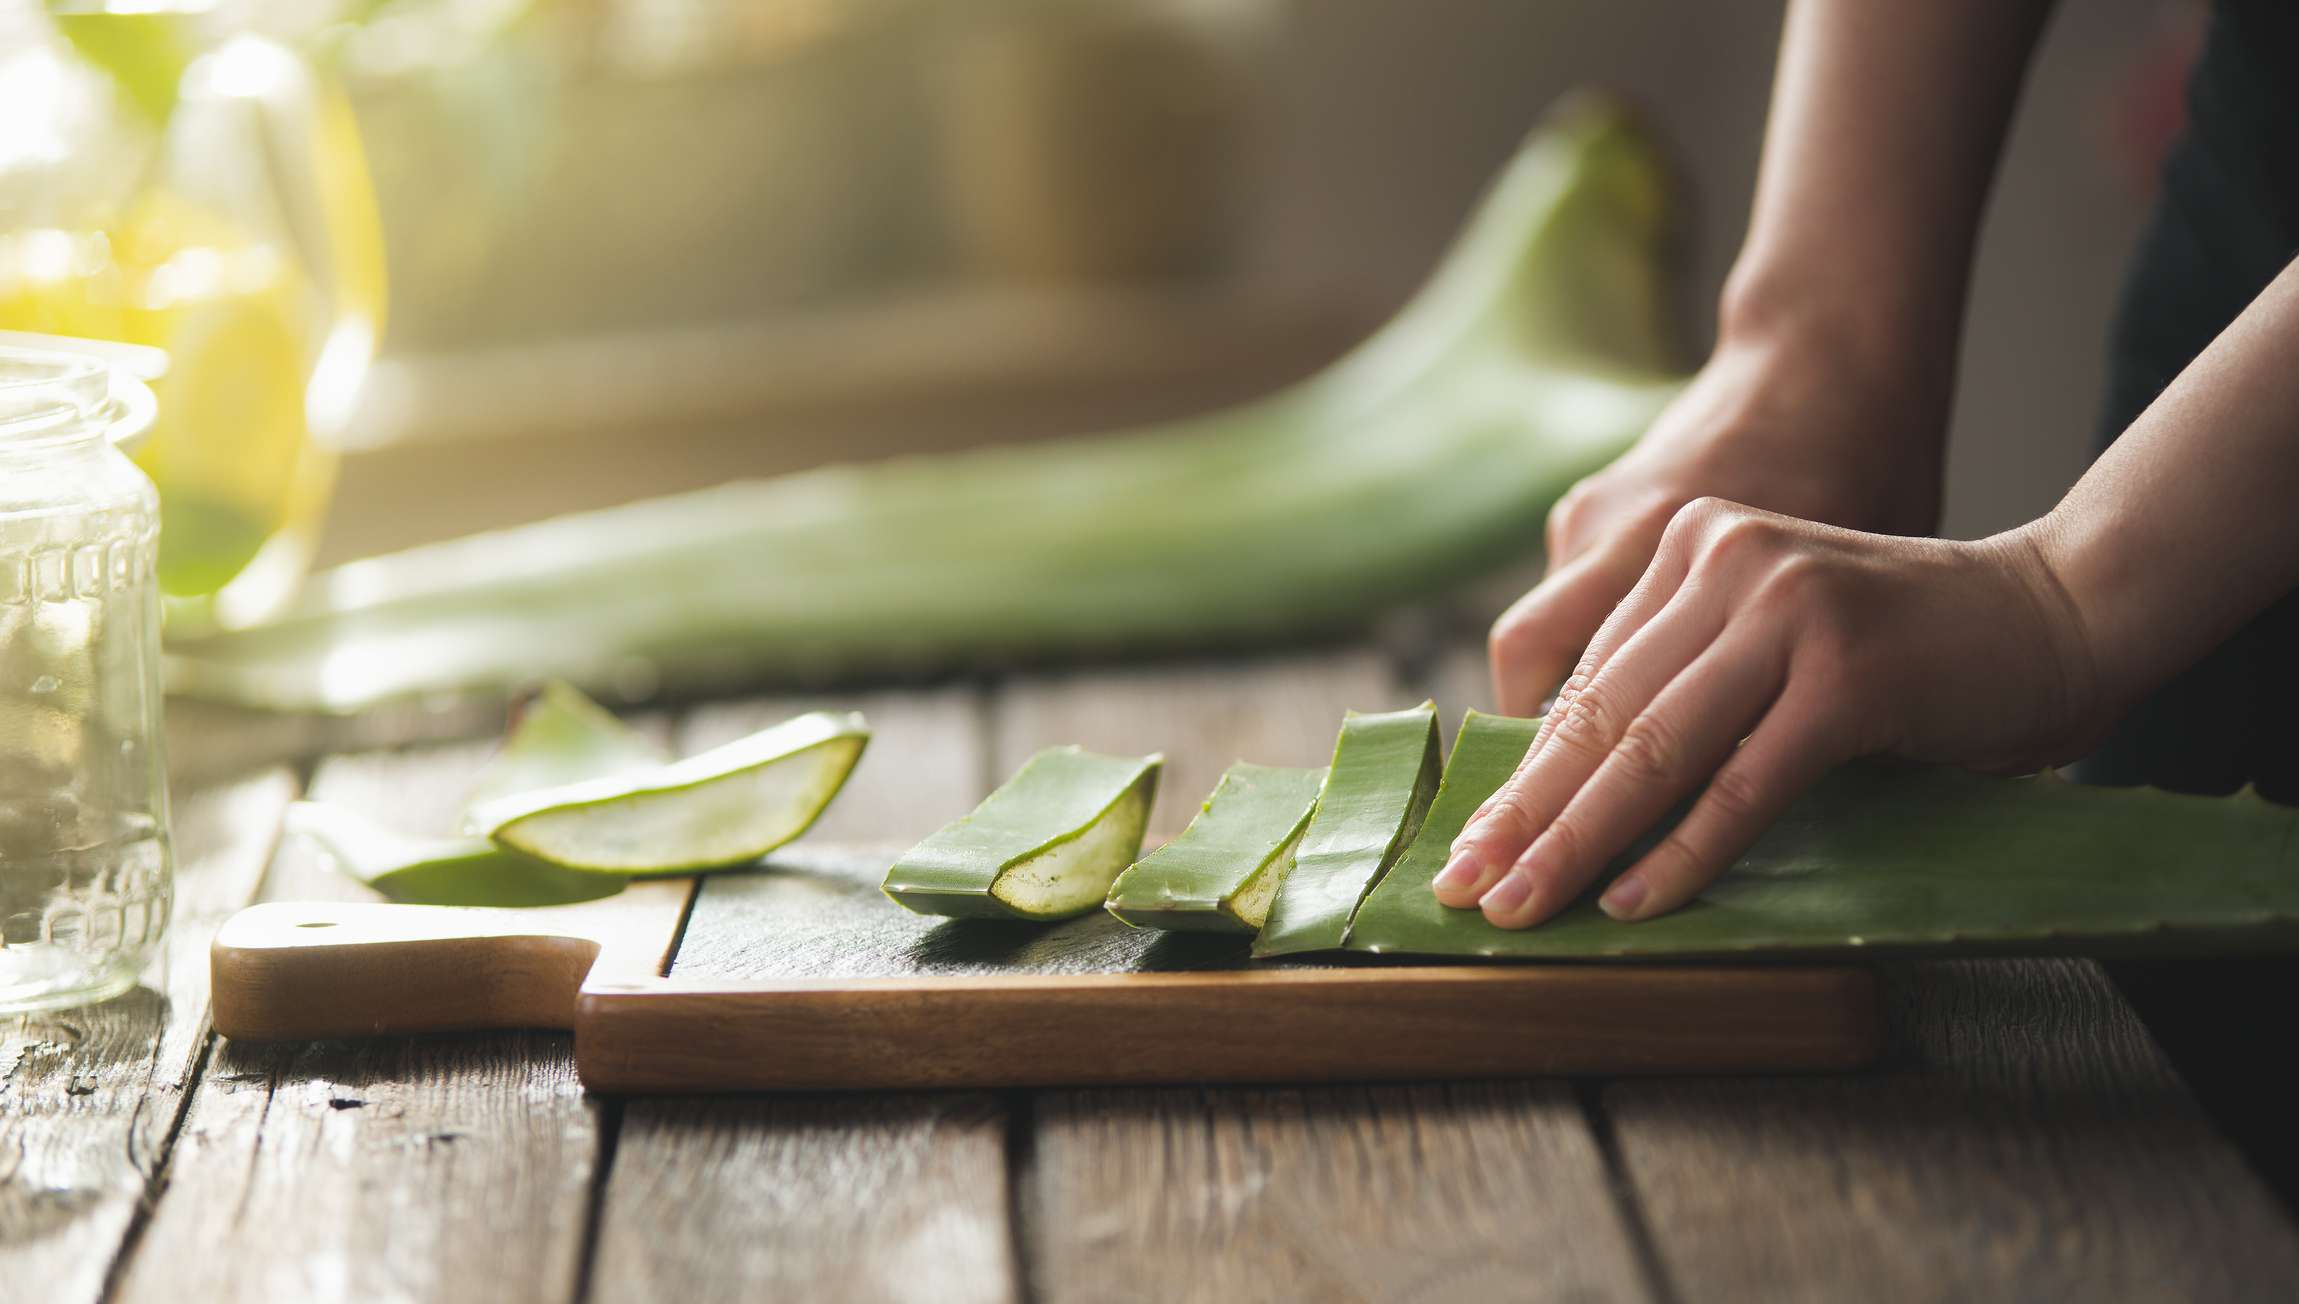 A woman chopping up aloe vera leaves on a wood cutting board.